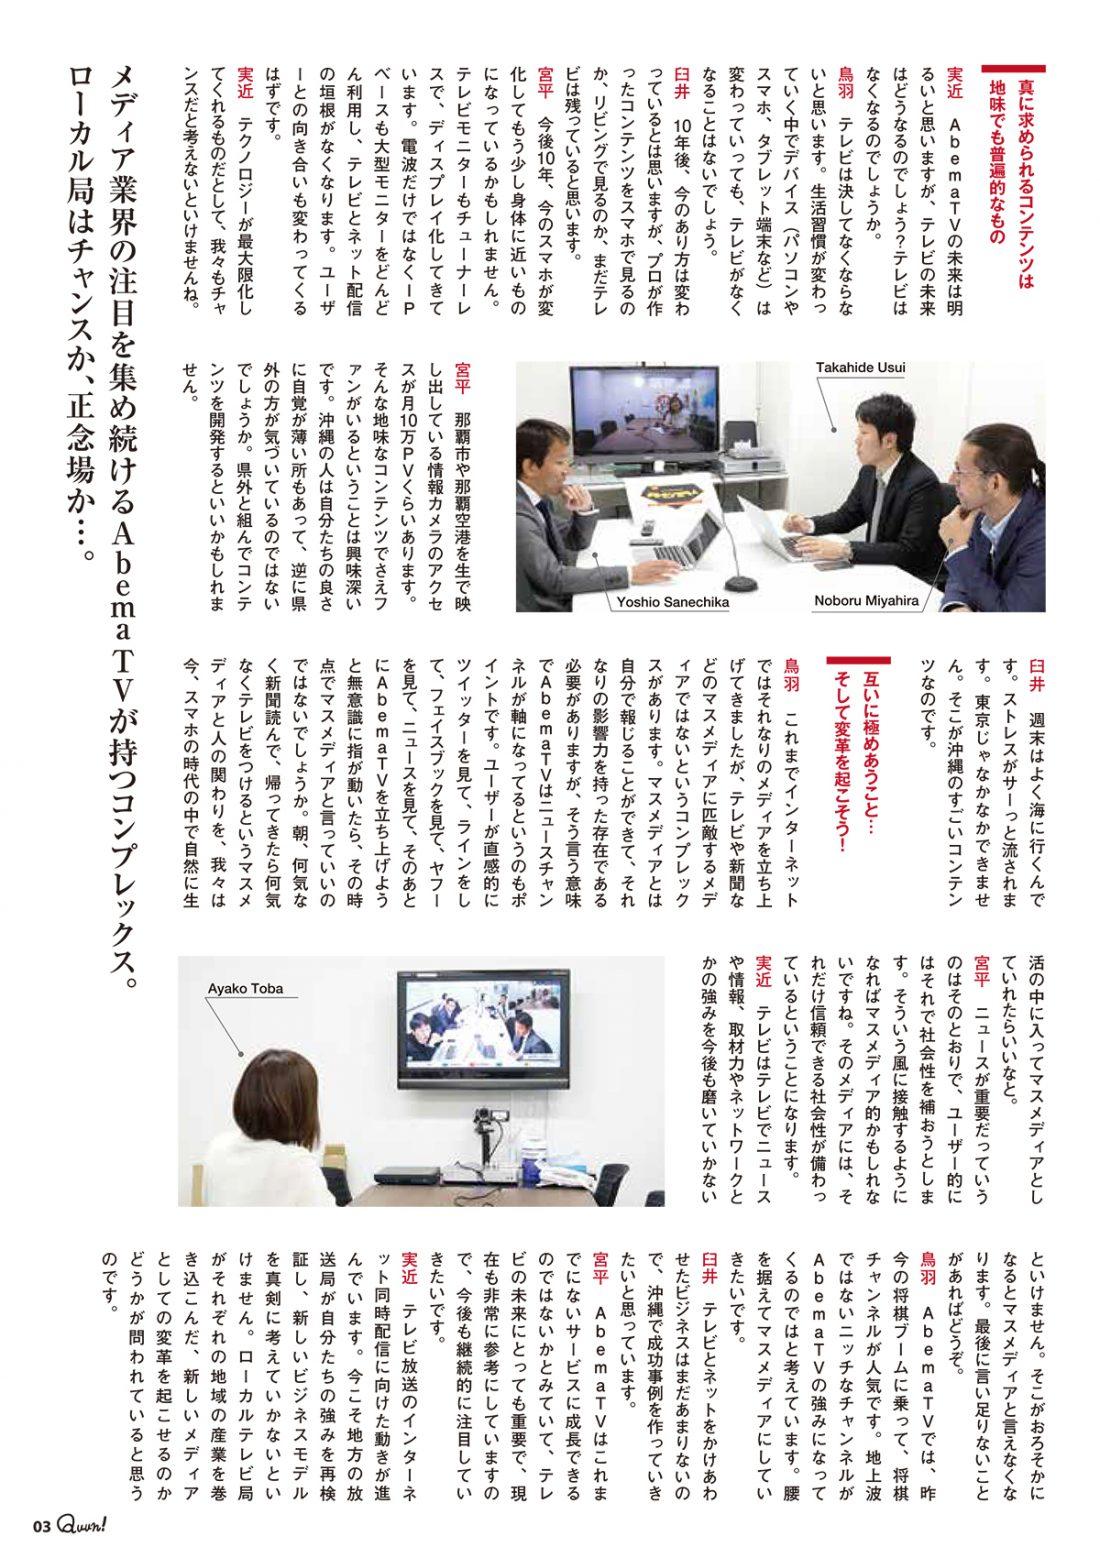 http://www.qab.co.jp/qgoro/wp-content/uploads/quun_0805-1100x1558.jpg